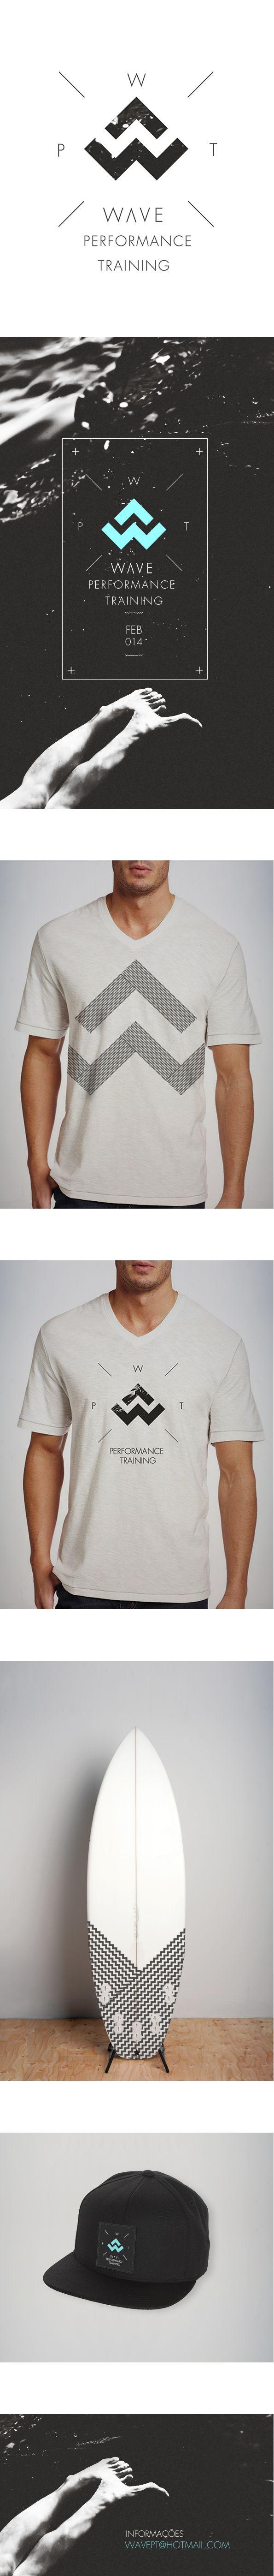 Wave Performance Training by Luis Vaz / logo / identity / branding / packaging / merchandize / shirts / surf / water / beach